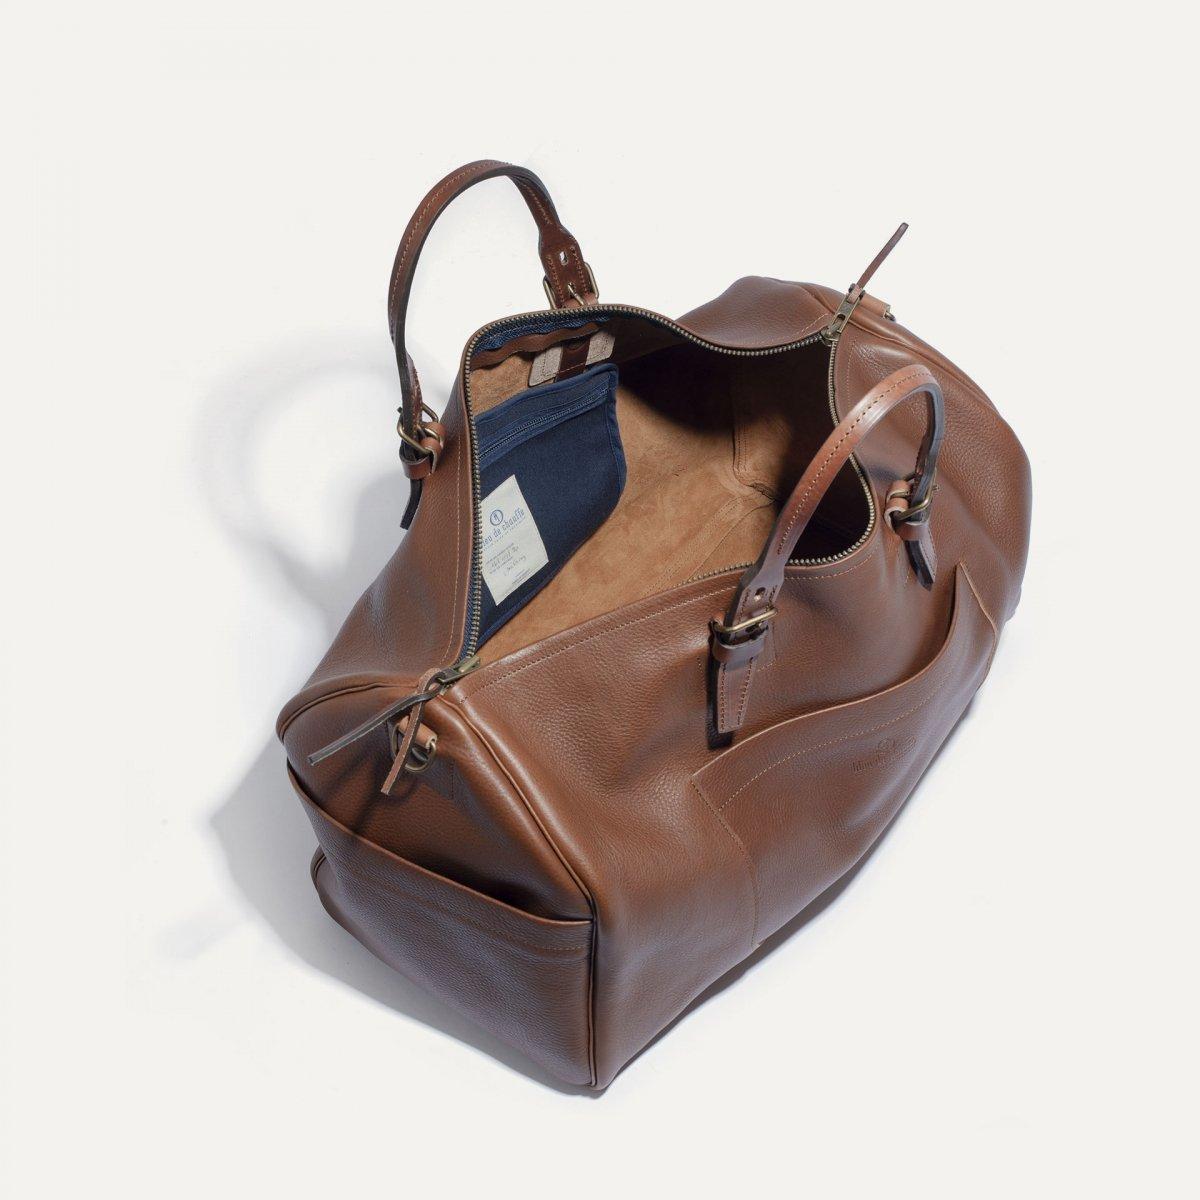 Hobo Travel bag - Cuba Libre (image n°4)